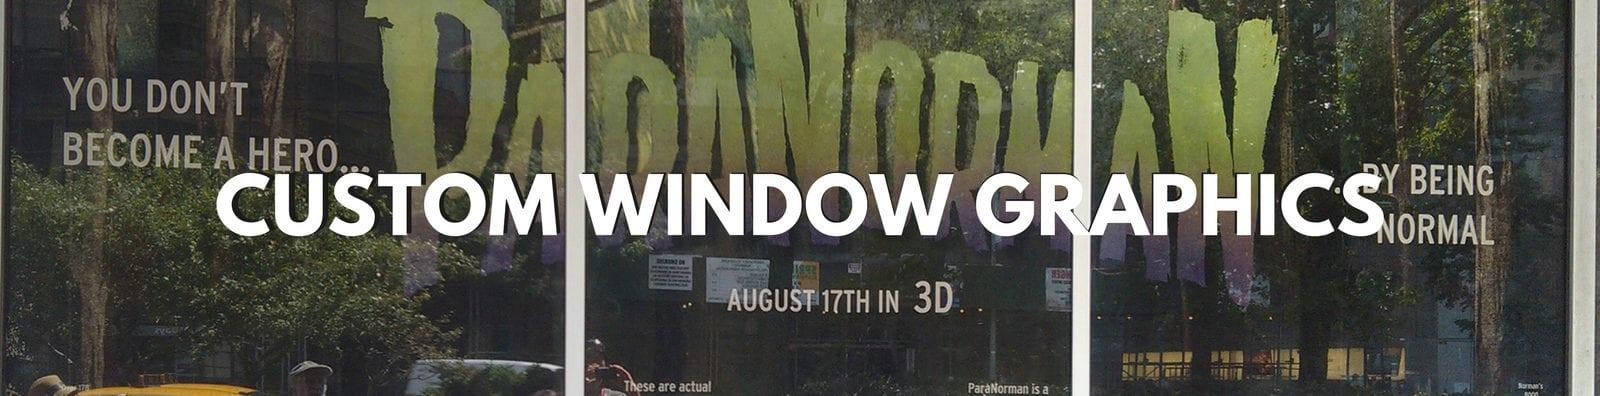 Custom vinyl window graphics window clings decals cushing